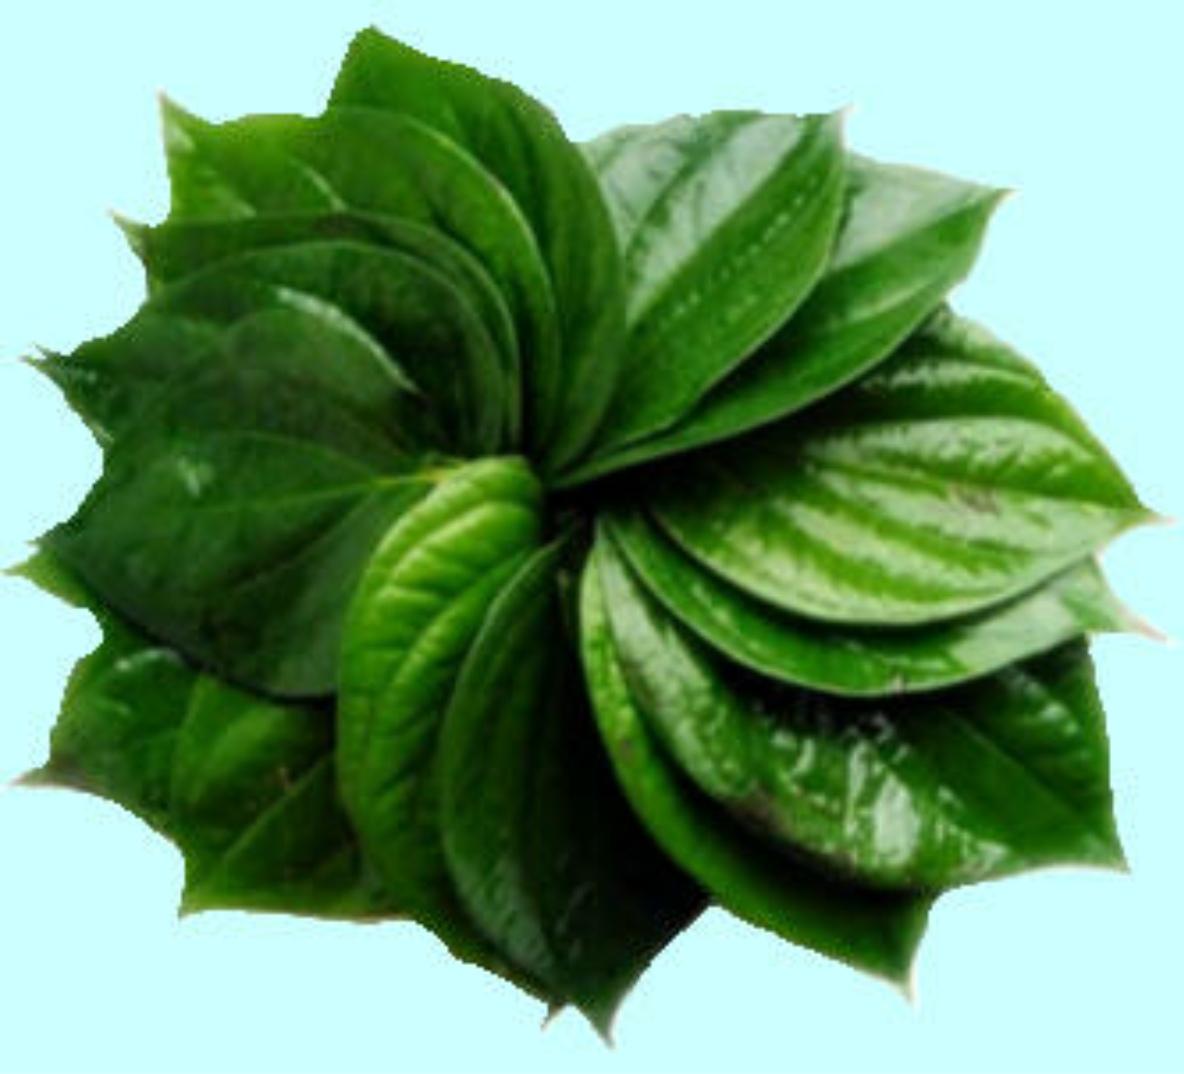 maycintadamayantixibb: Betel Leaves Meaning In Tamil